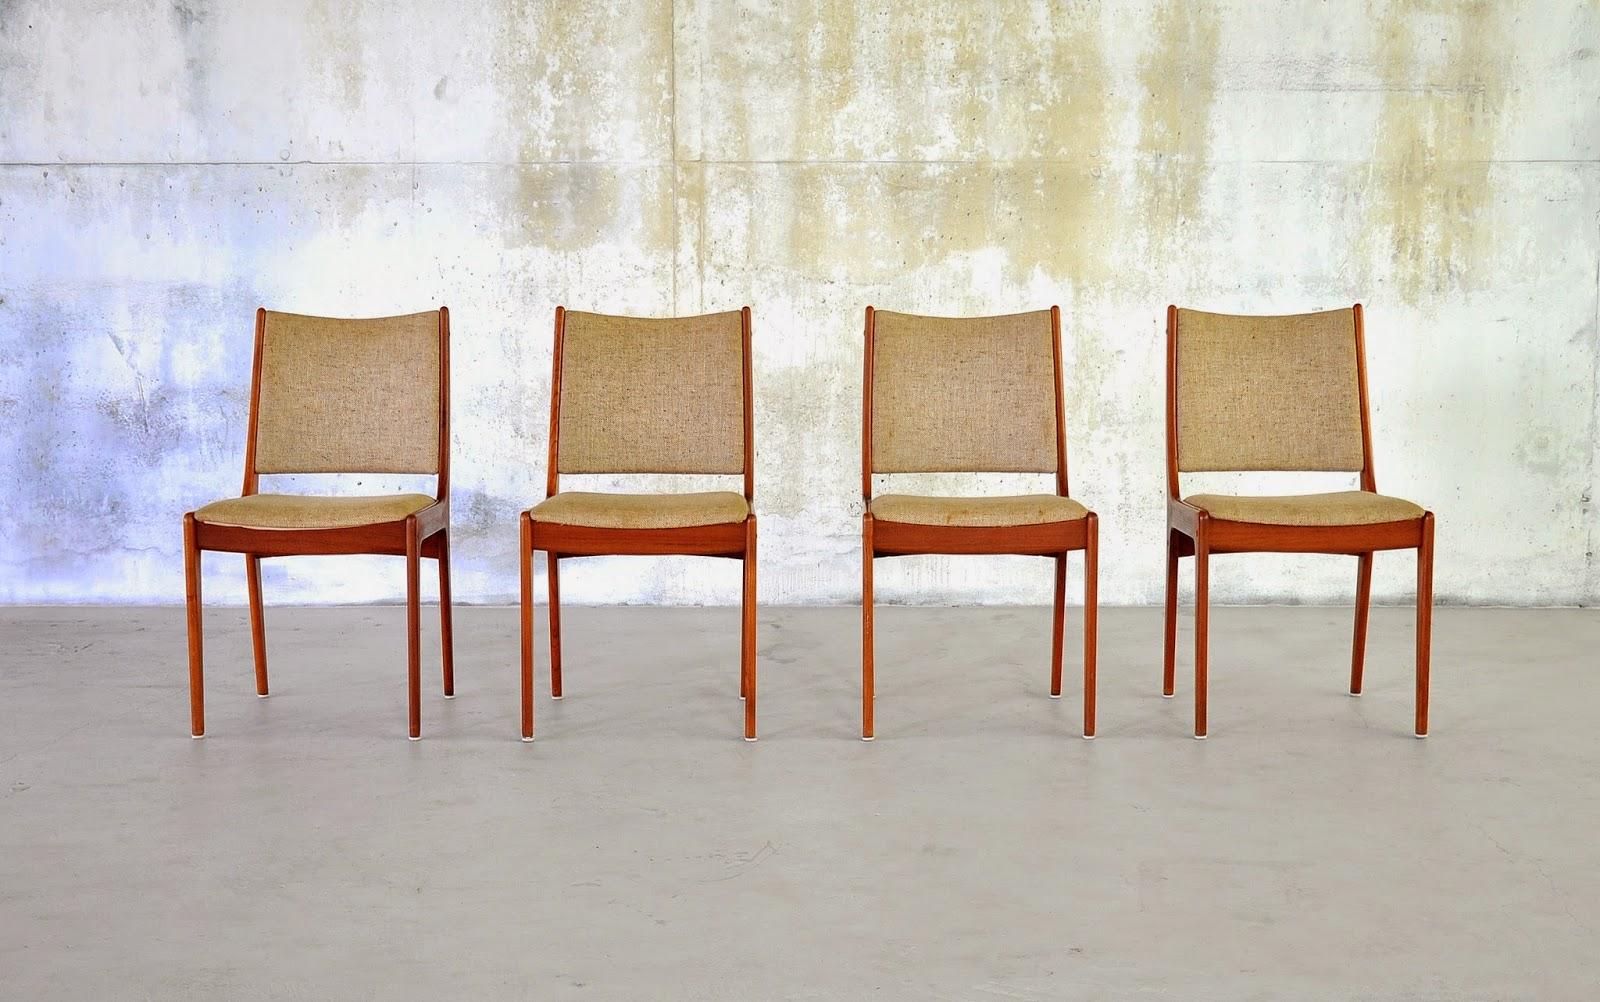 Select Modern Set Of 4 Danish Modern Teak Dining Chairs